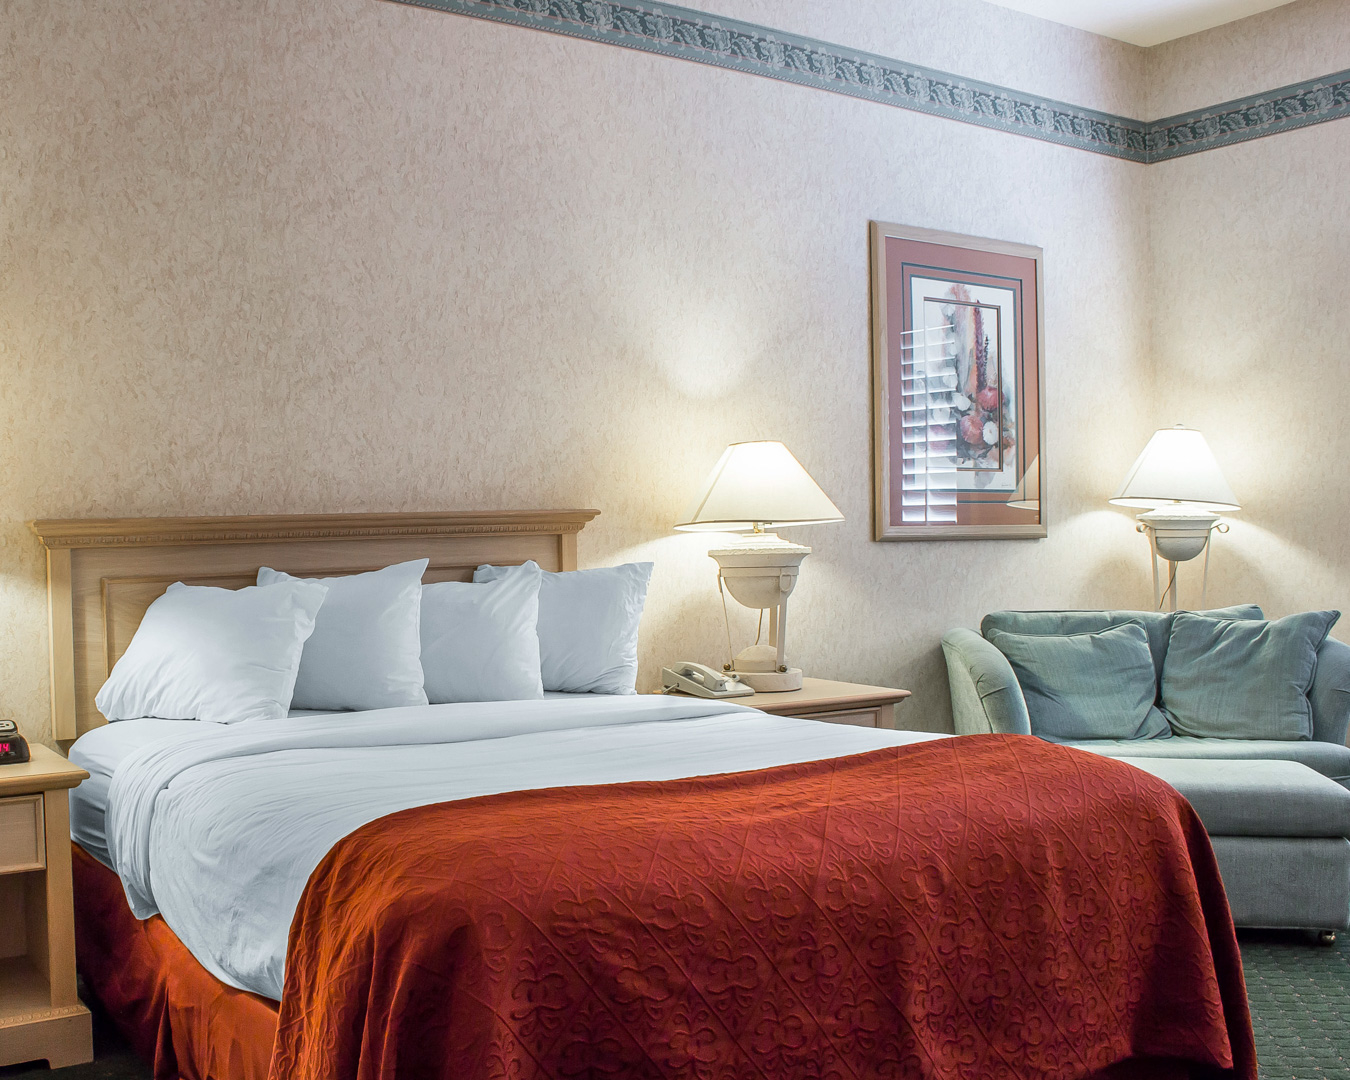 Quality Inn & Suites, Safford AZ